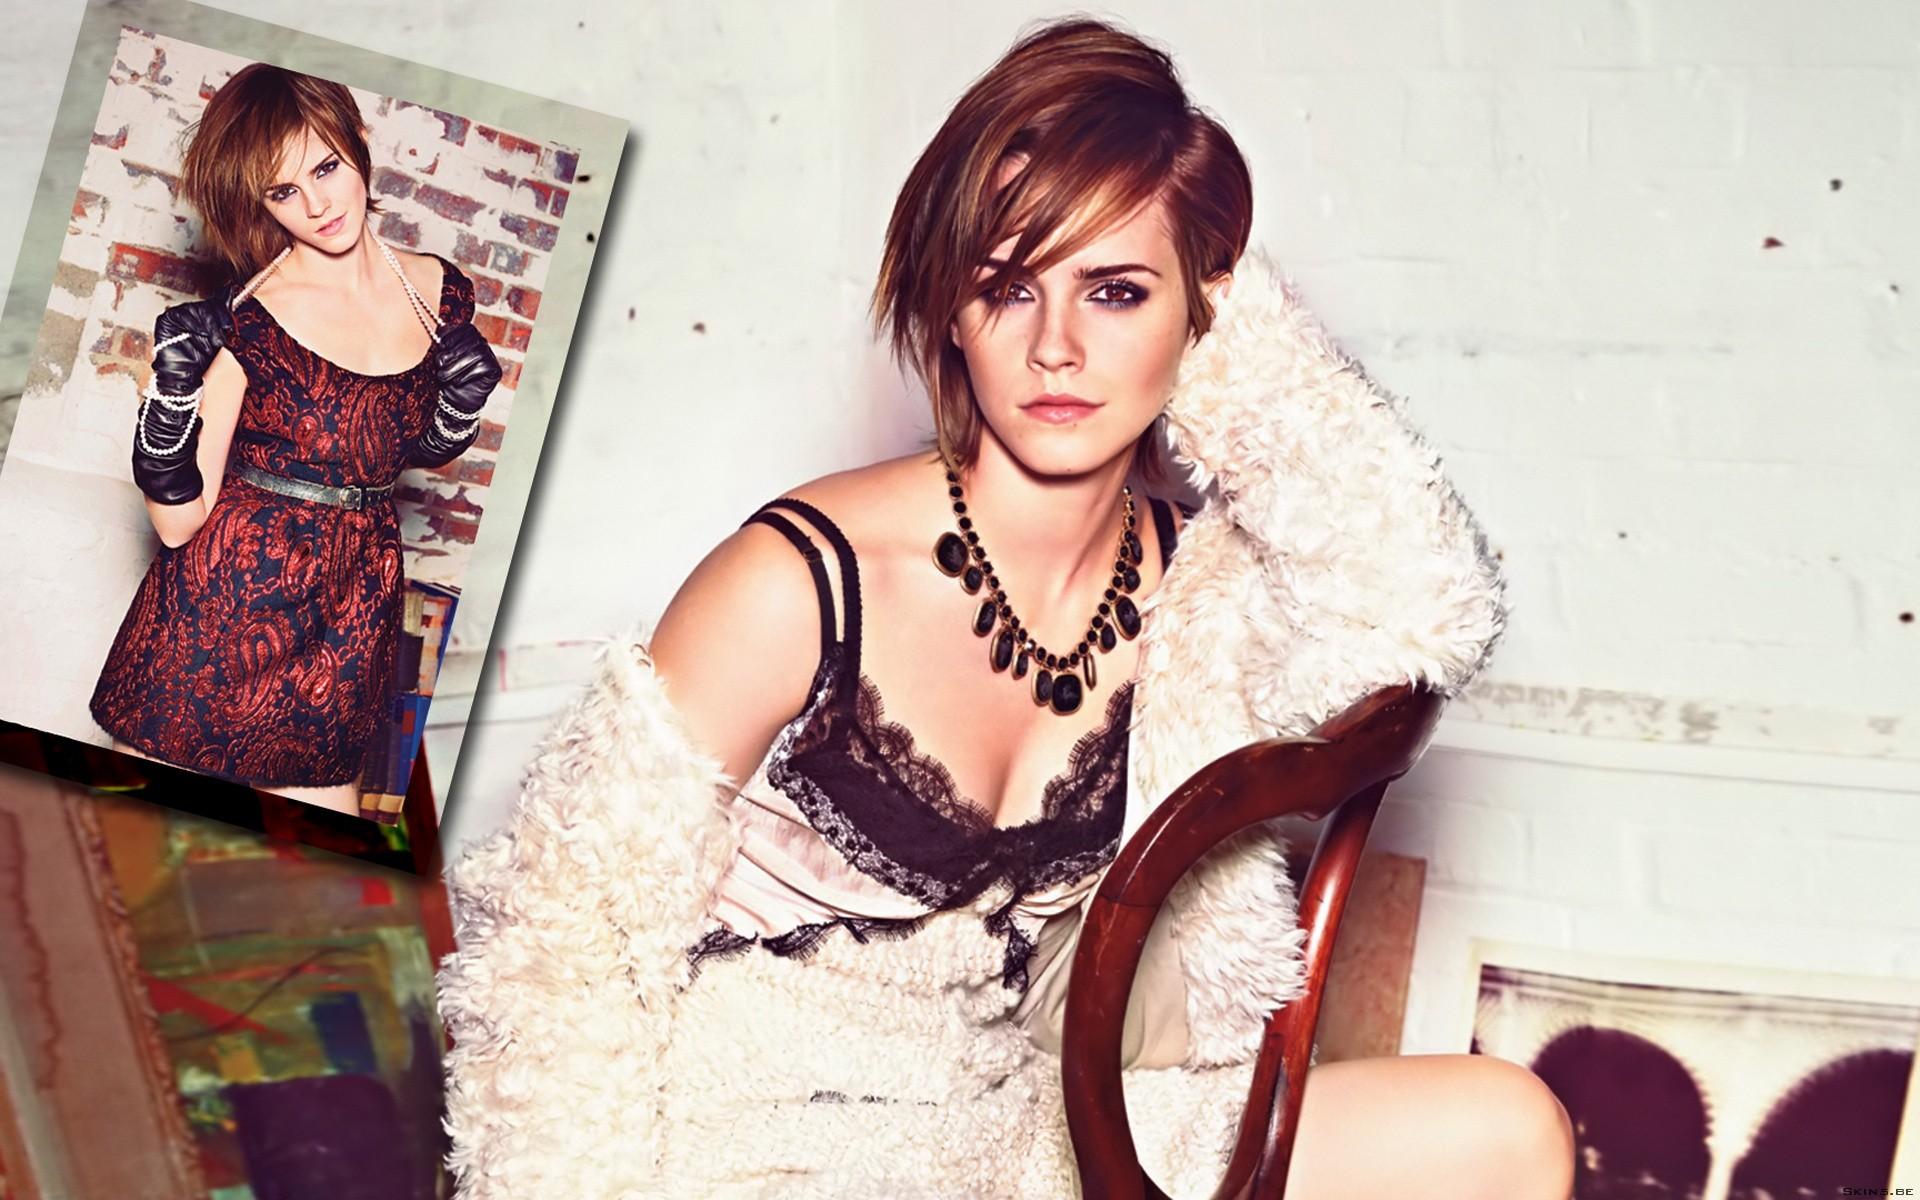 Wallpaper Model Rambut Pendek Kacamata Merah Aktris Gaun Mode Emma Watson Orang Pakaian Gadis Keindahan Wanita Fotografi Potret Pemotretan 1920x1200 Iterations 337378 Hd Wallpapers Wallhere